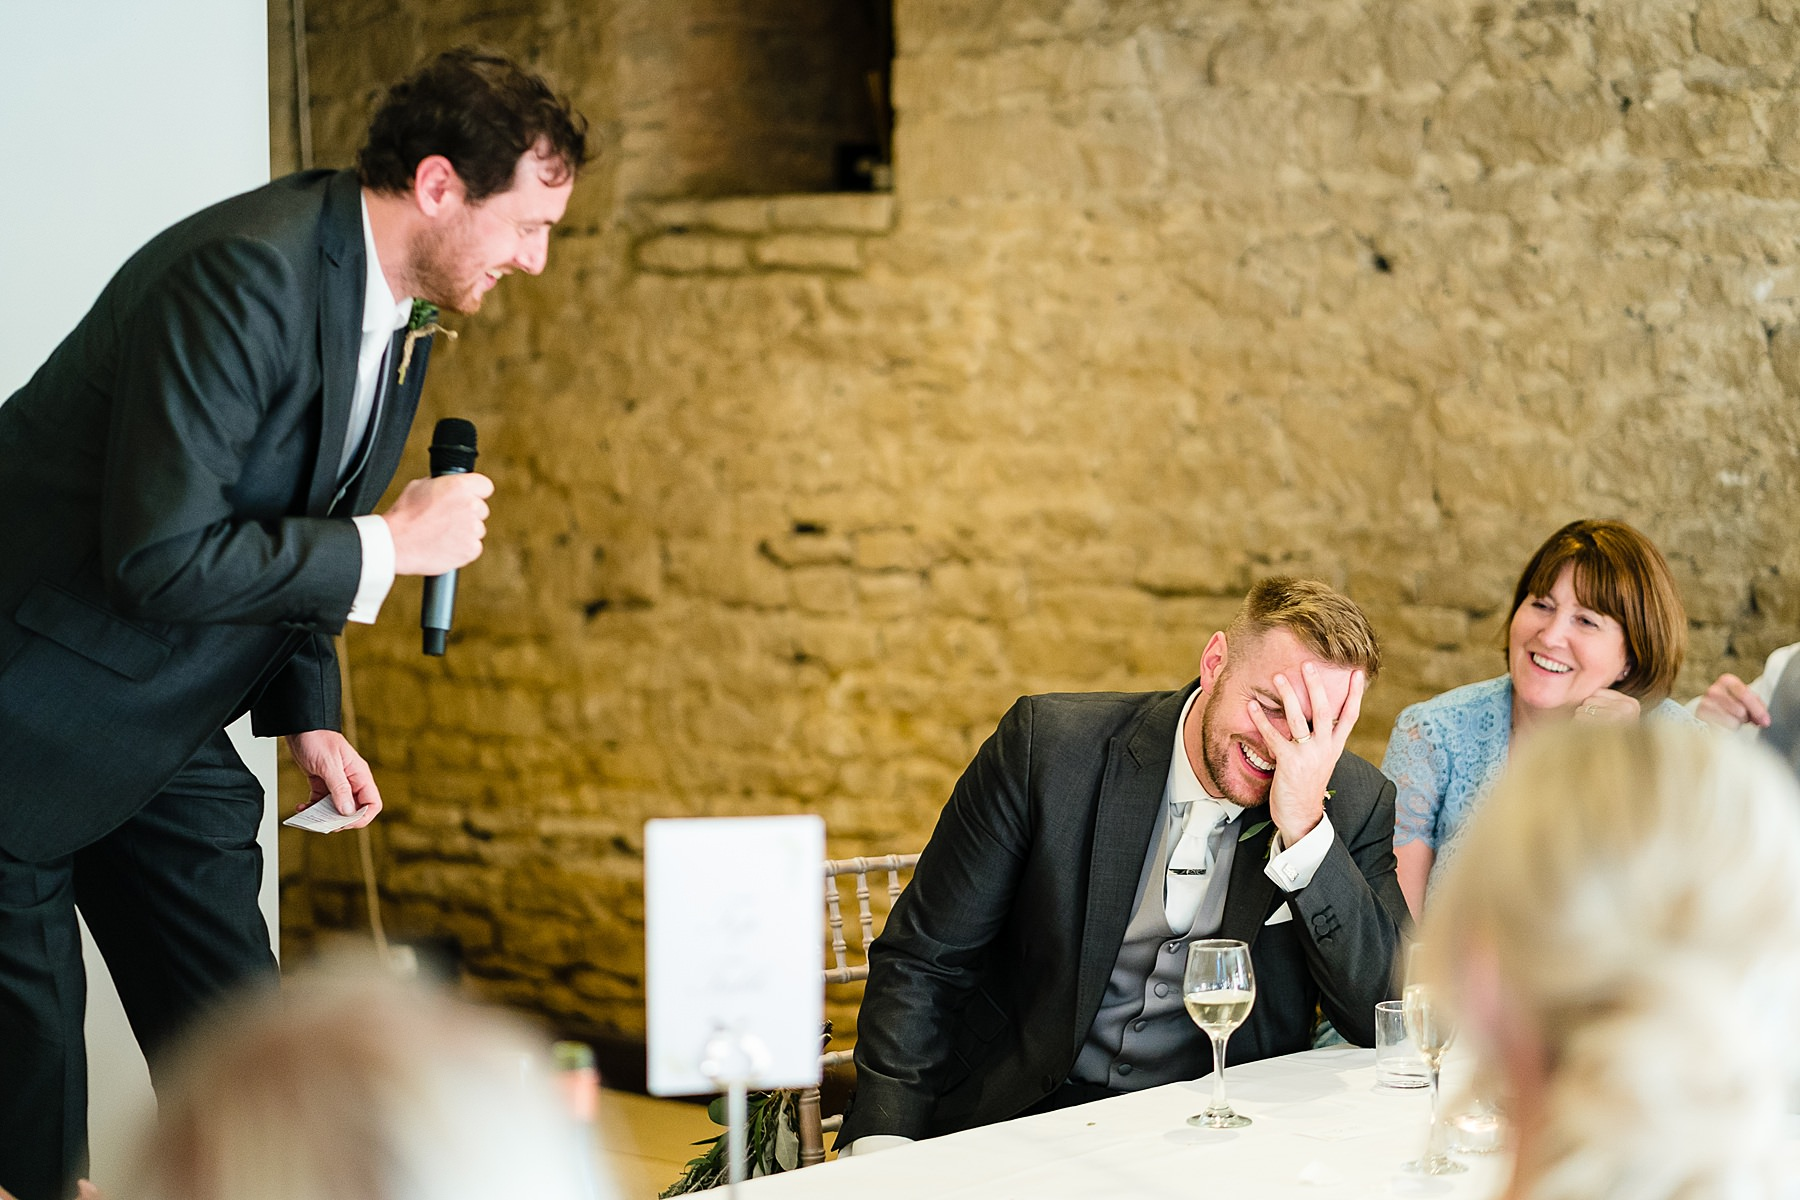 groom looks embarassed at speech